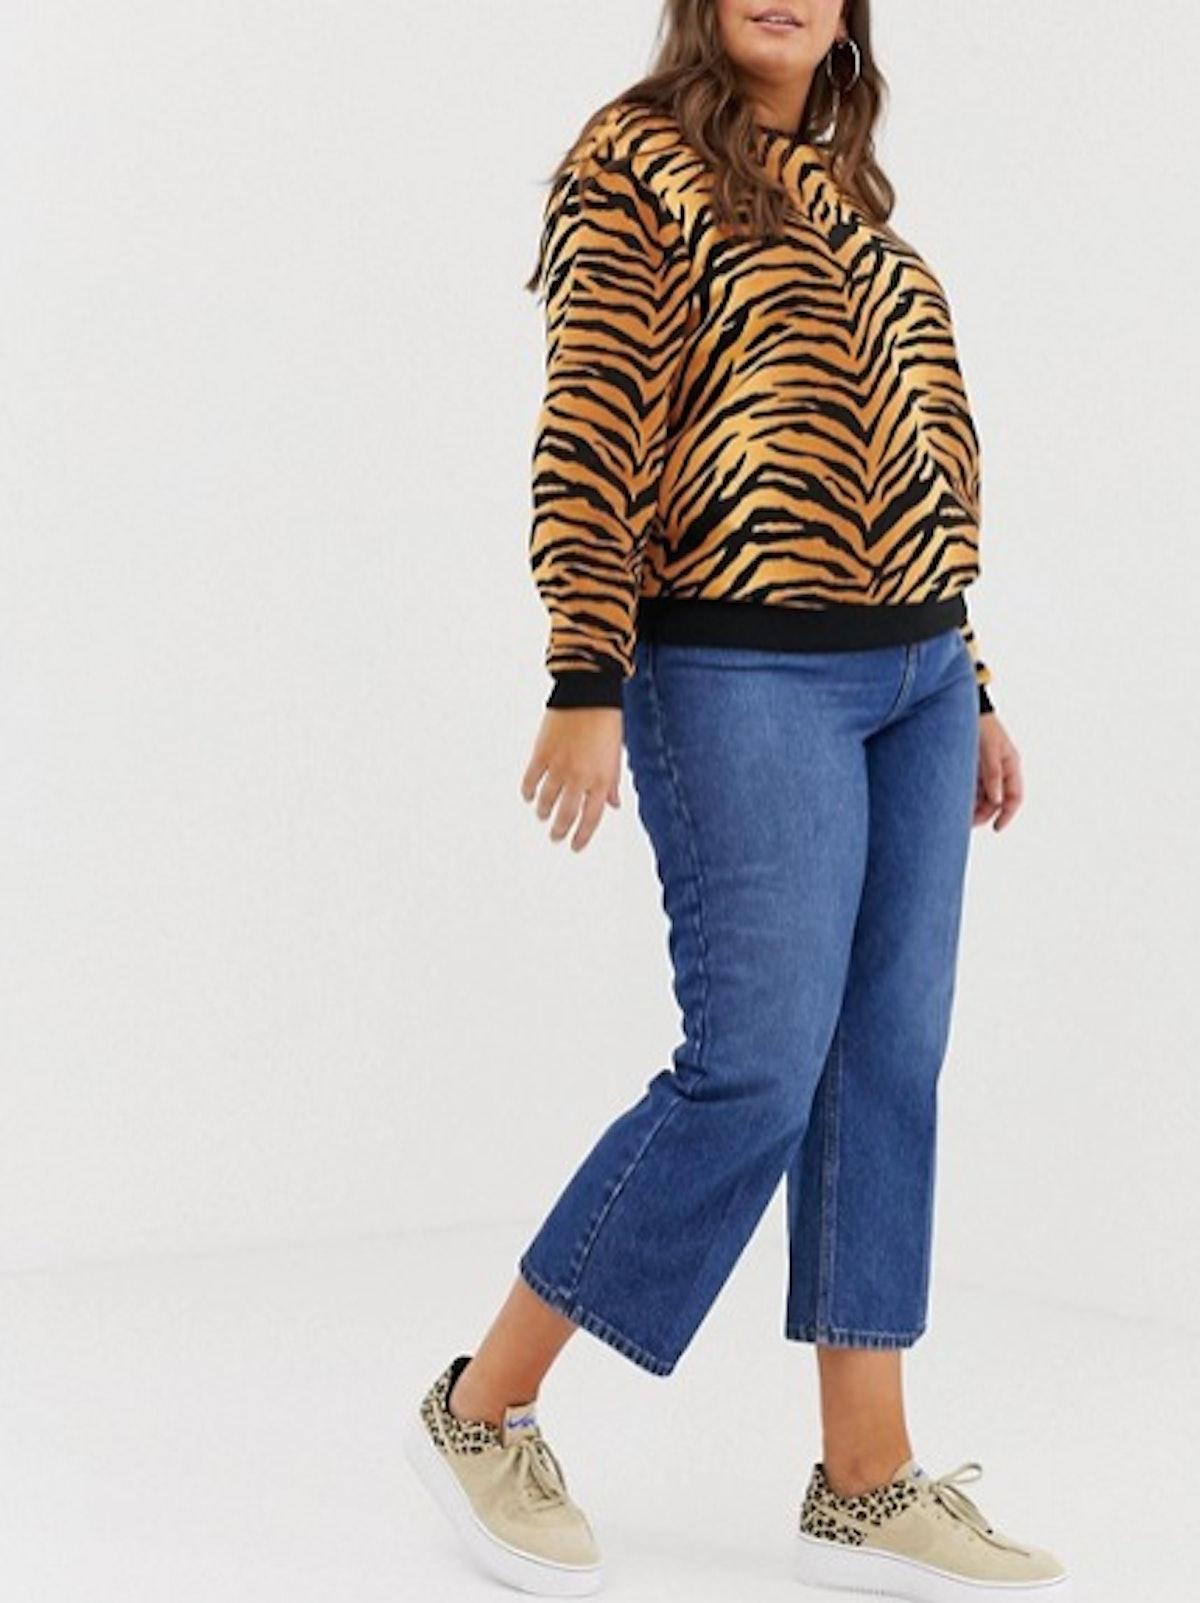 Sweatshirt In All Over Animal Tiger Print